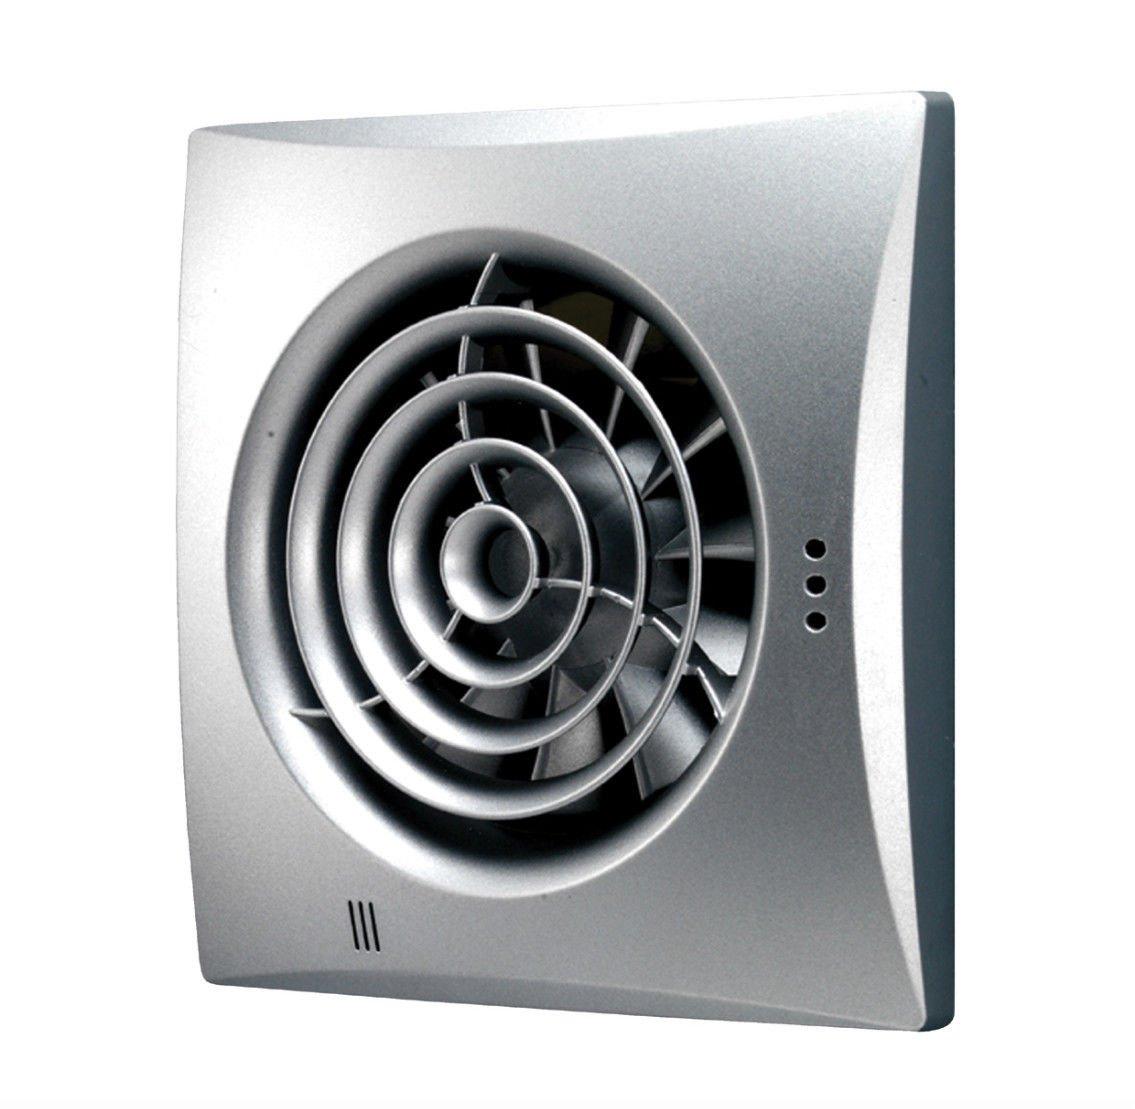 HIB-Hush-Timer-Wall-Fan-In-Chrome